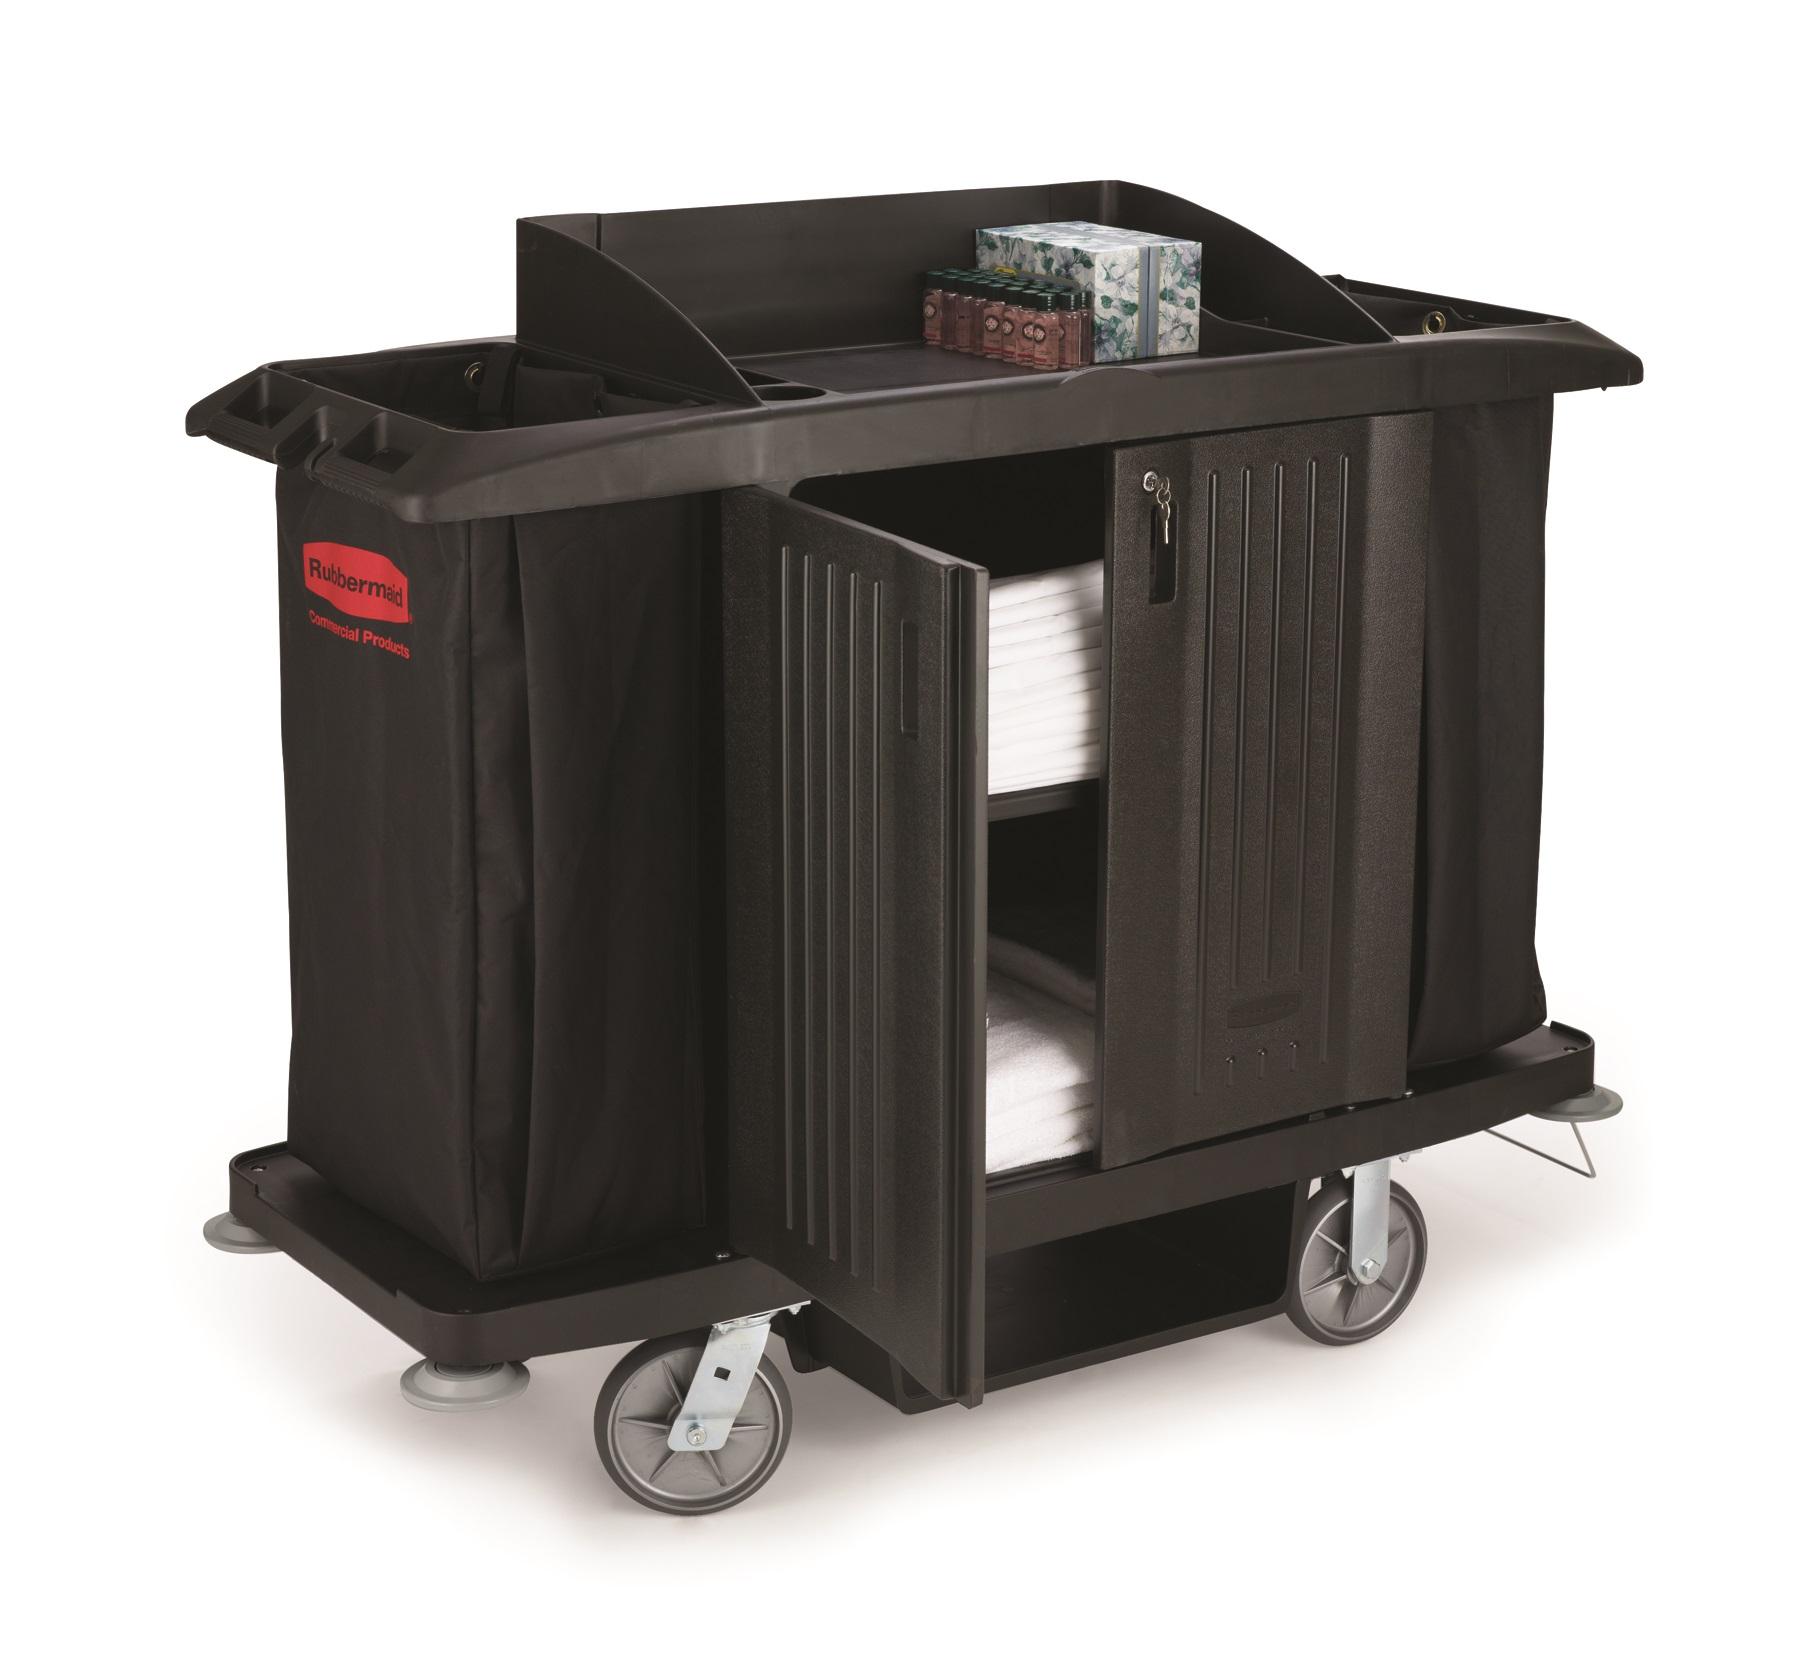 photo of rubbermaid housekeeping cart